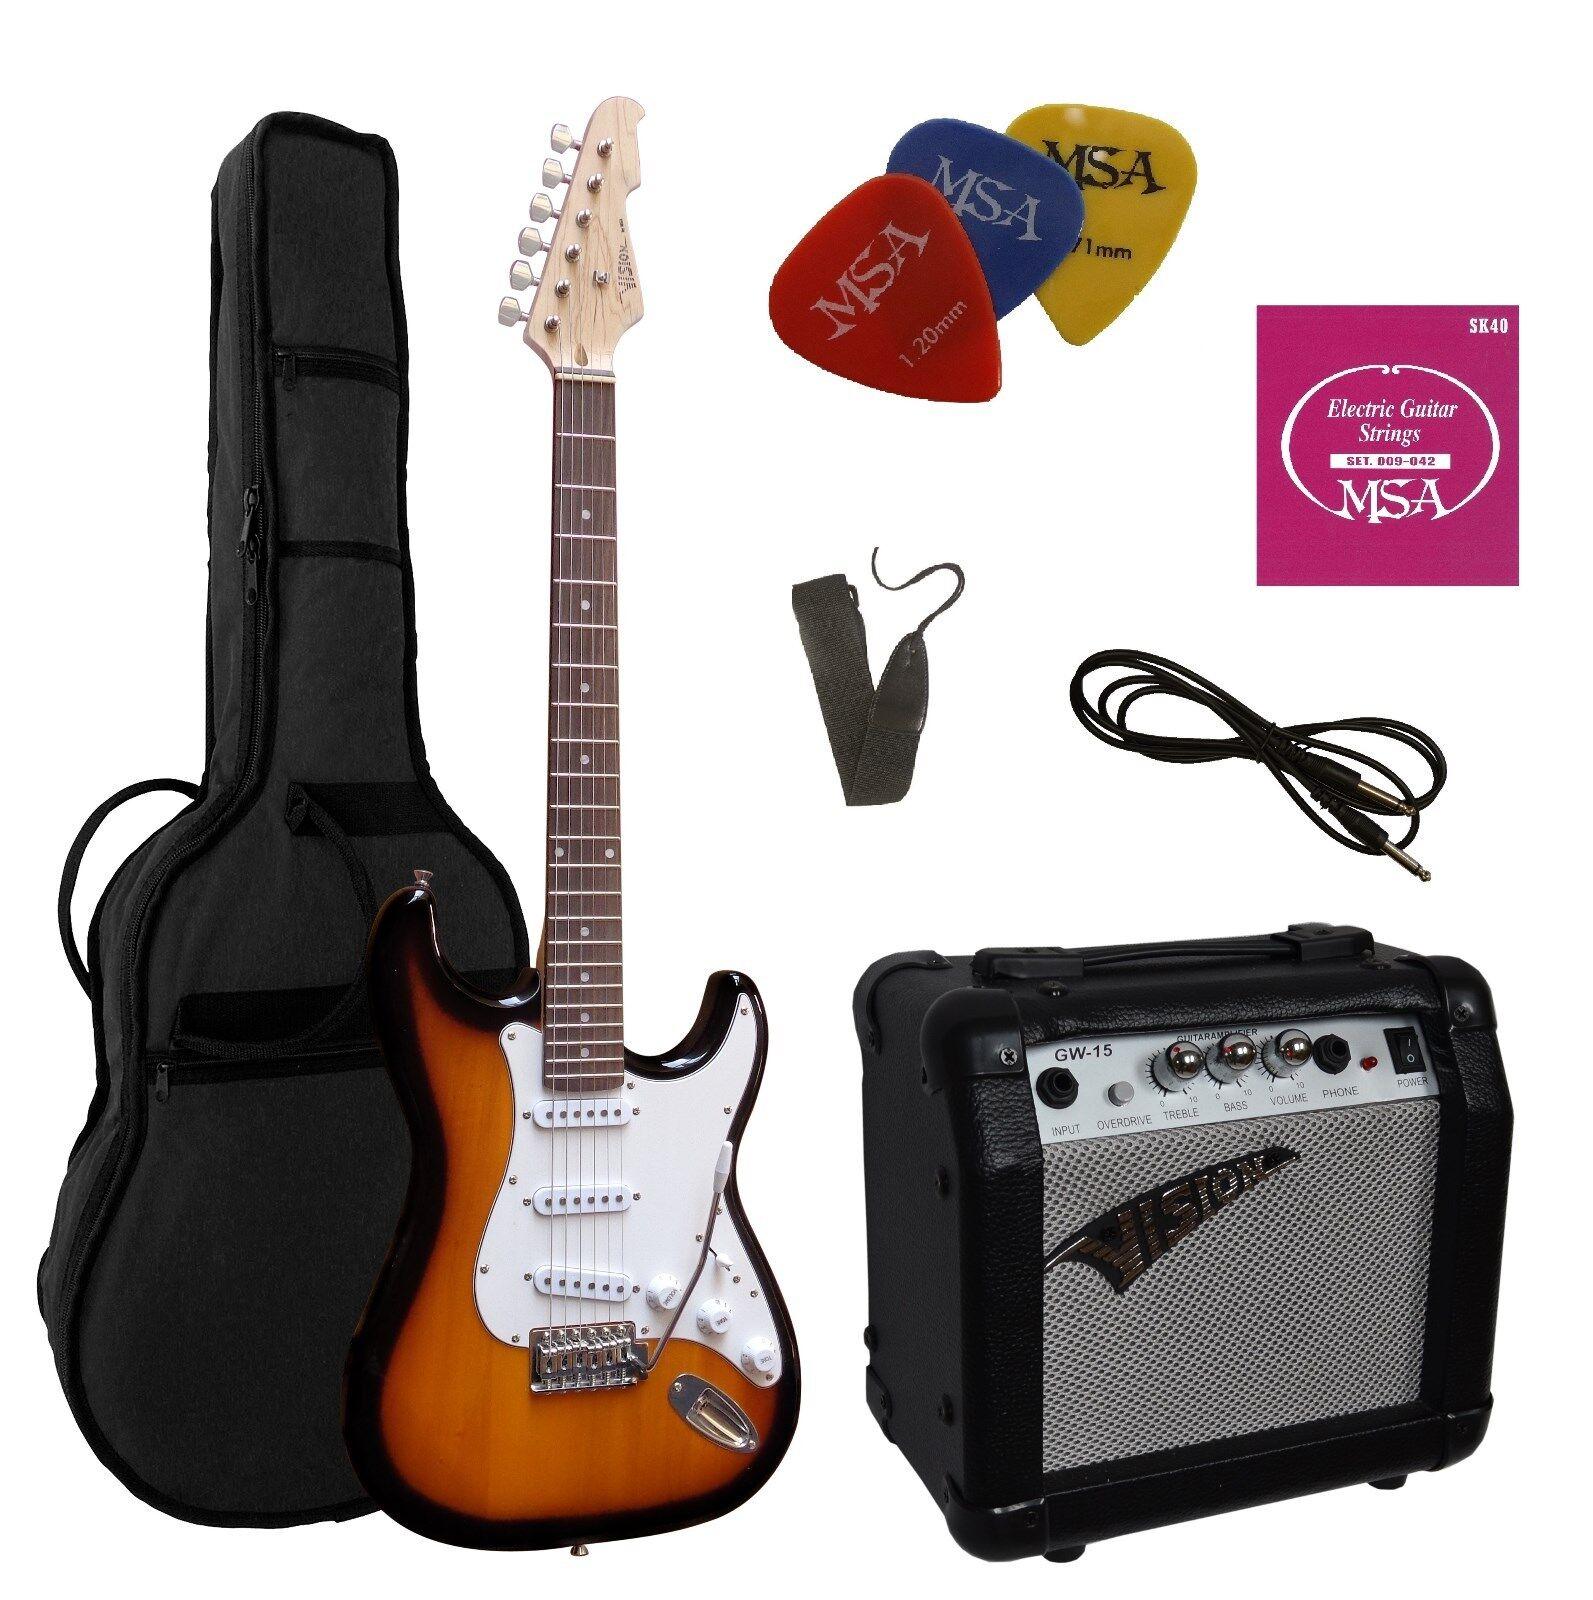 E Gitarre Set - ST5-sunburst Zubehör, Verstärker GW15,Tasche, Gurt, 3xPik,Saiten